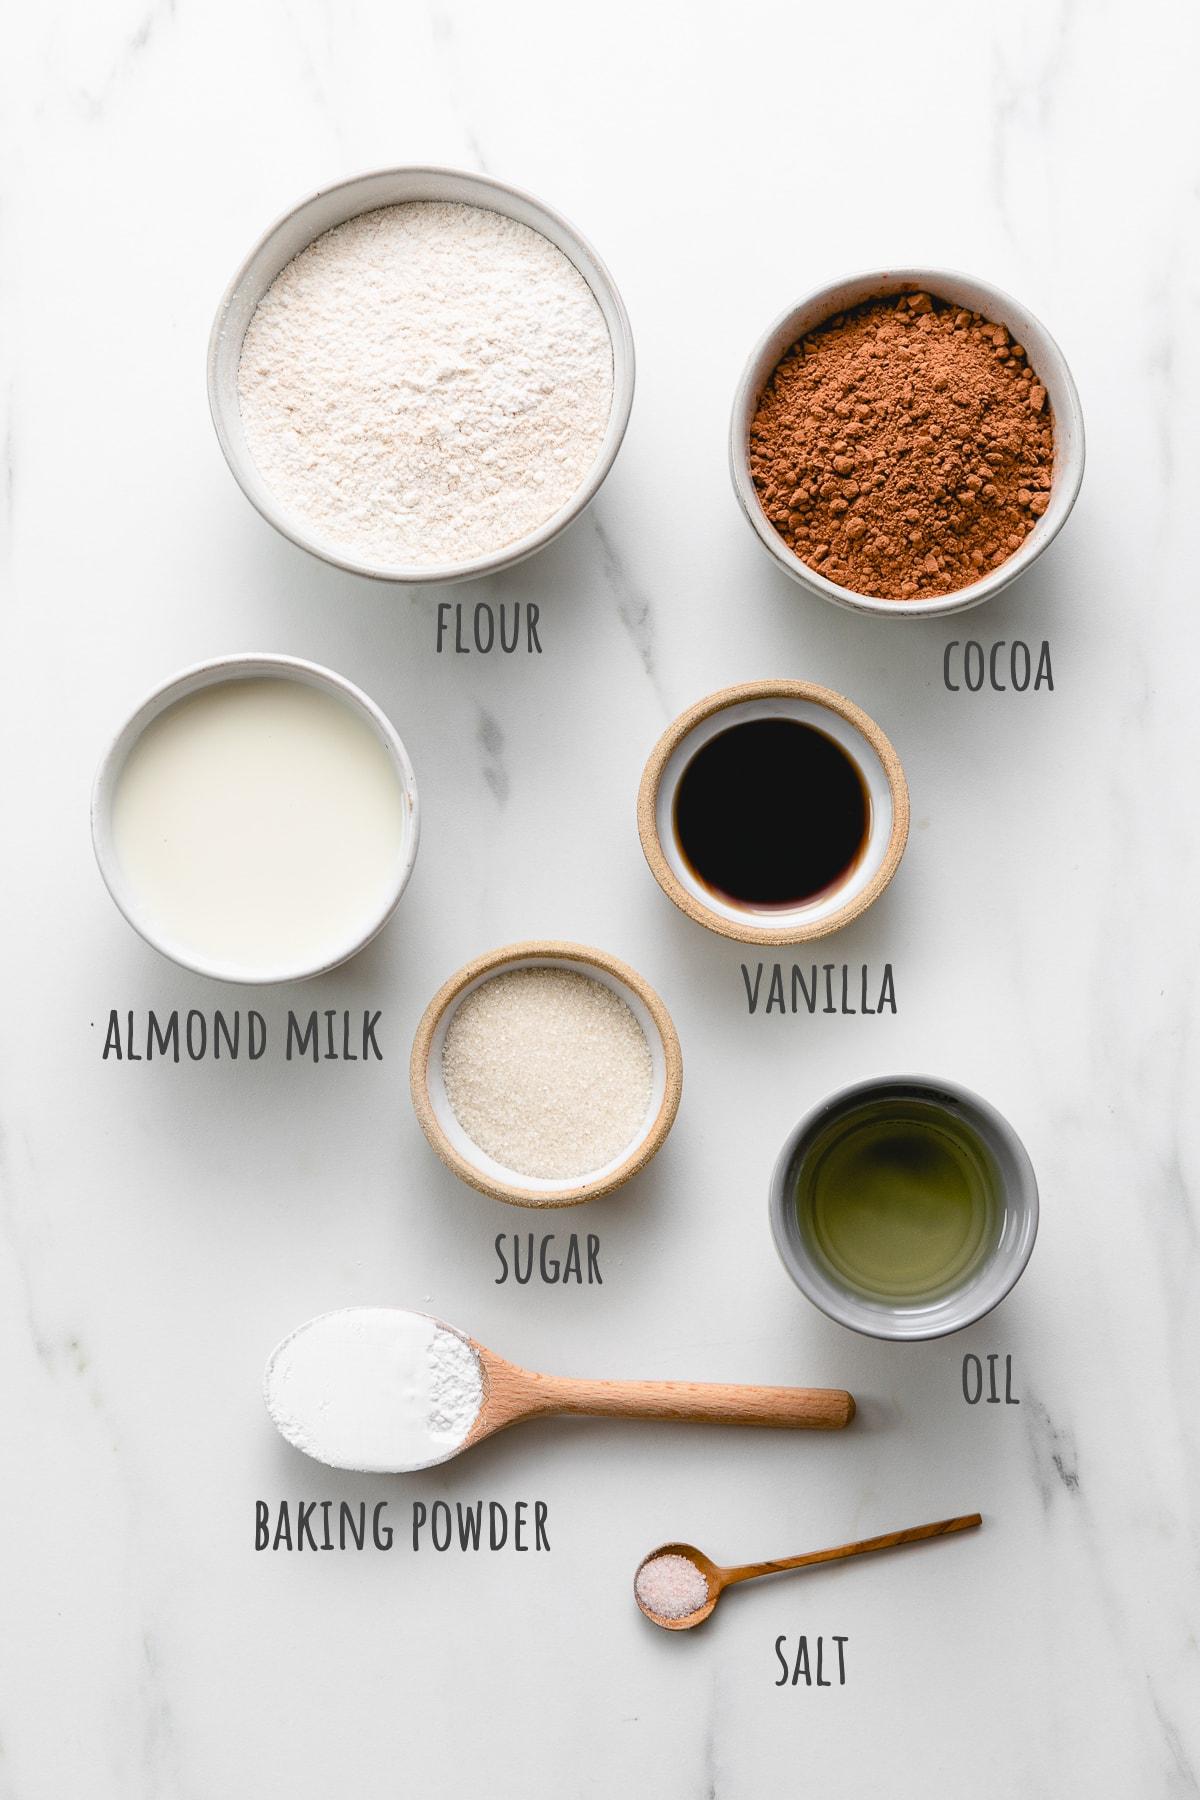 top down ingredients used to make vegan chocolate waffles recipe.